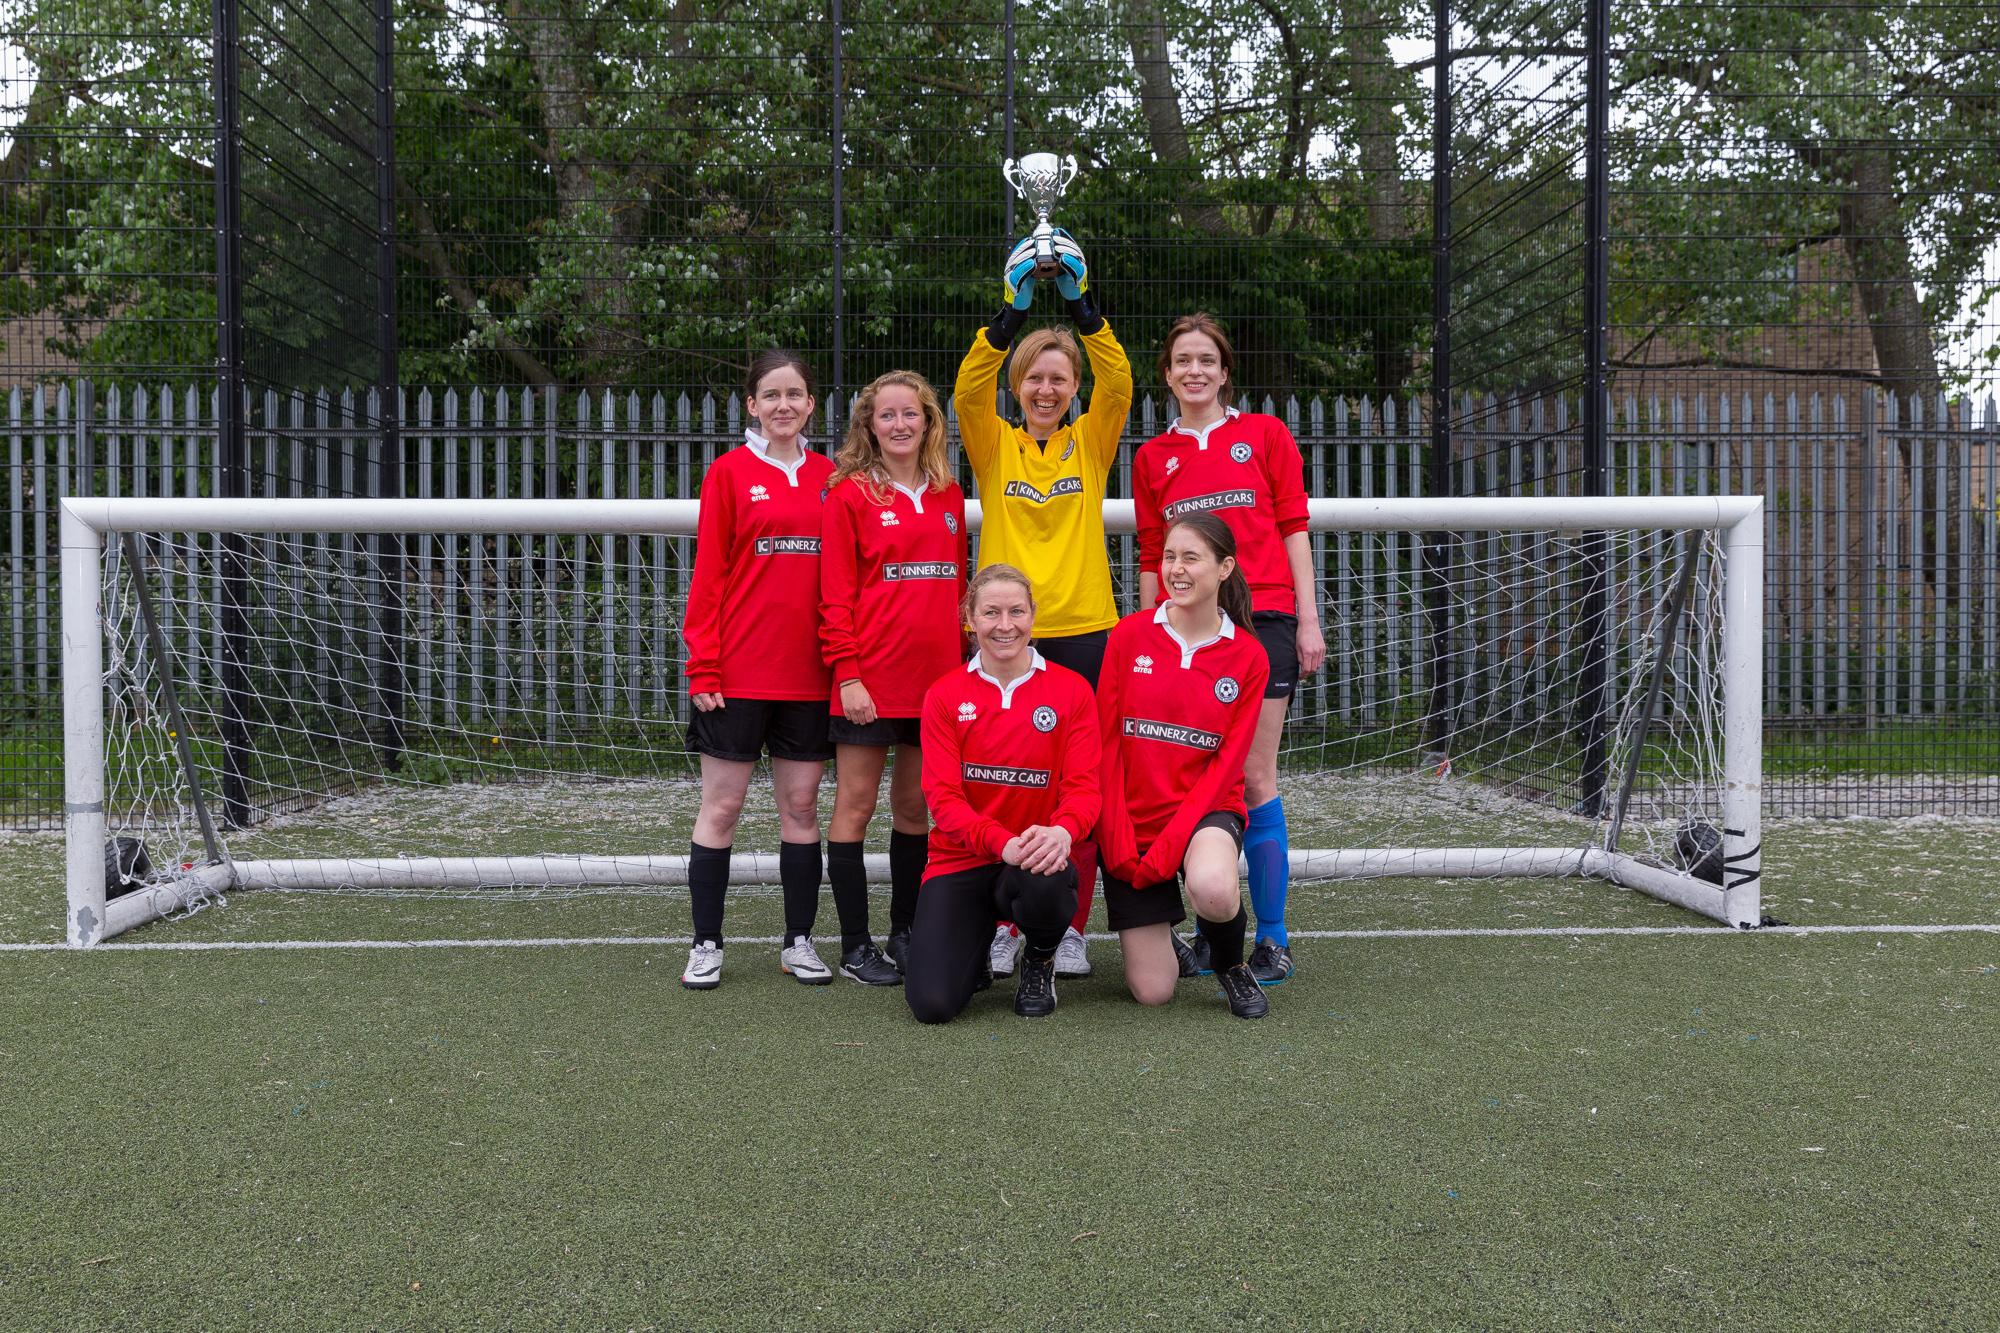 Isaacson Invitational Cup 2017